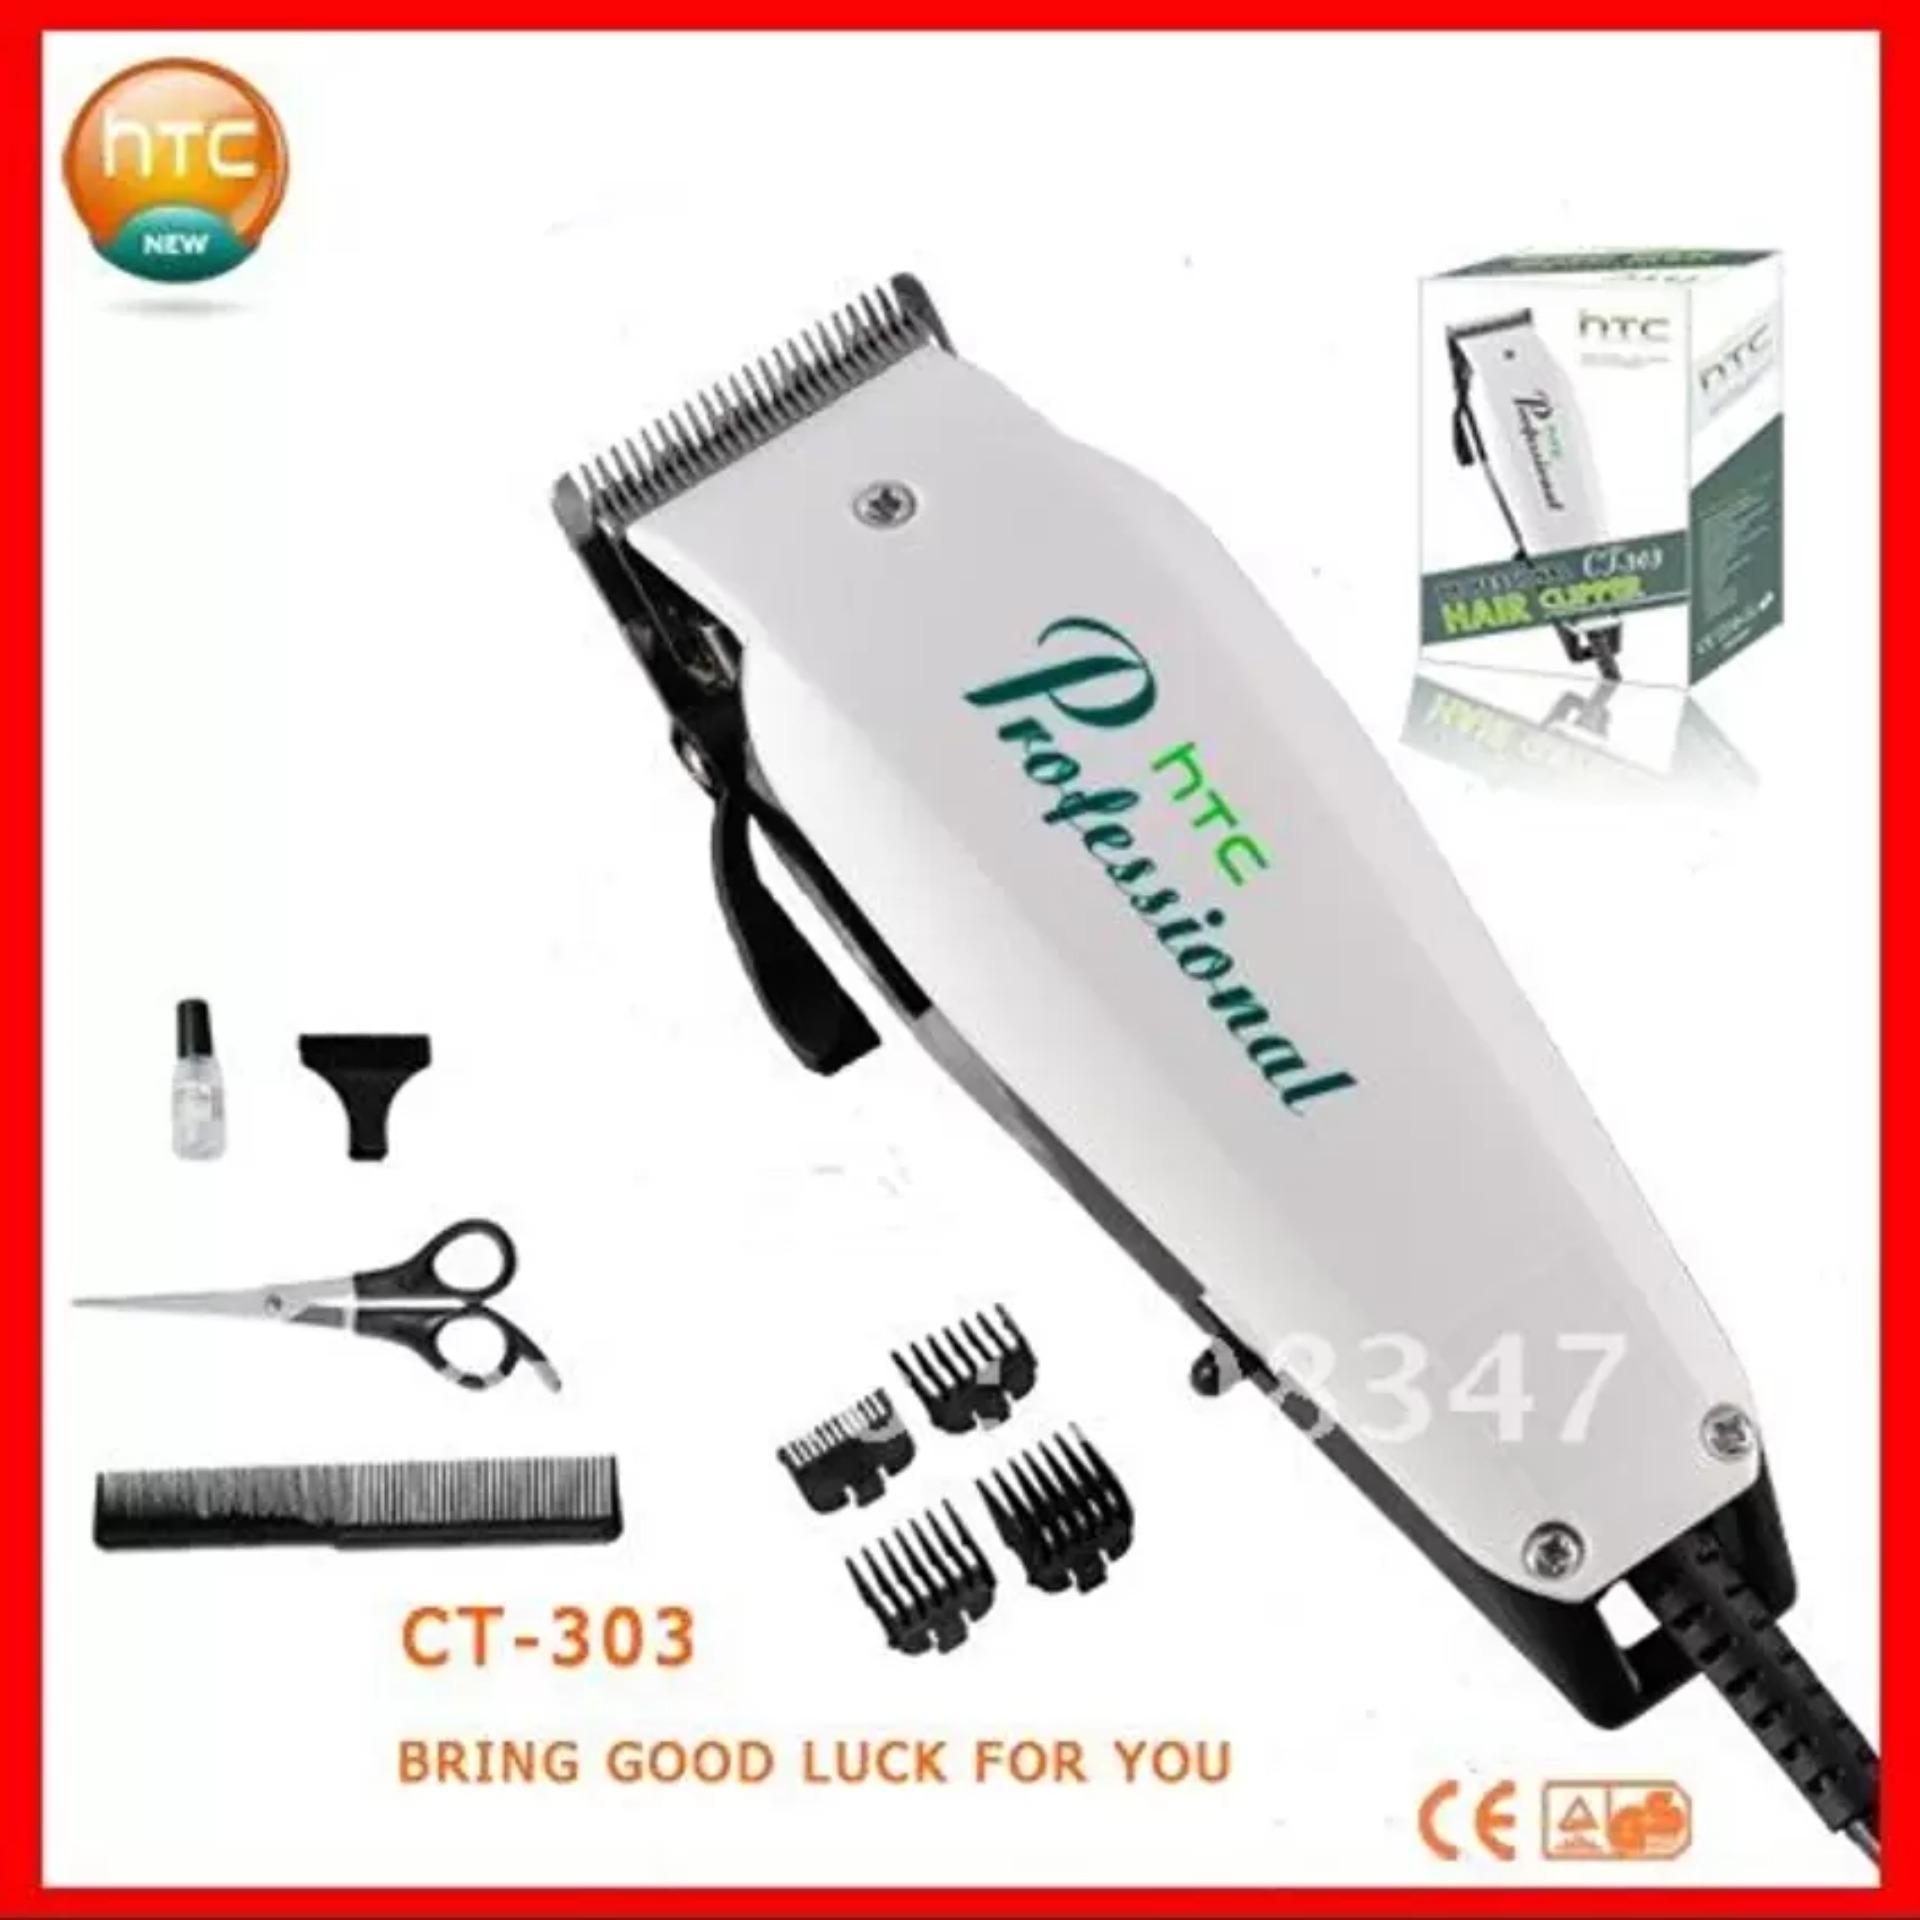 ... HTC CT-303 Hair Clipper Mesin Alat Cukur Potong Pangkas Rambut ...